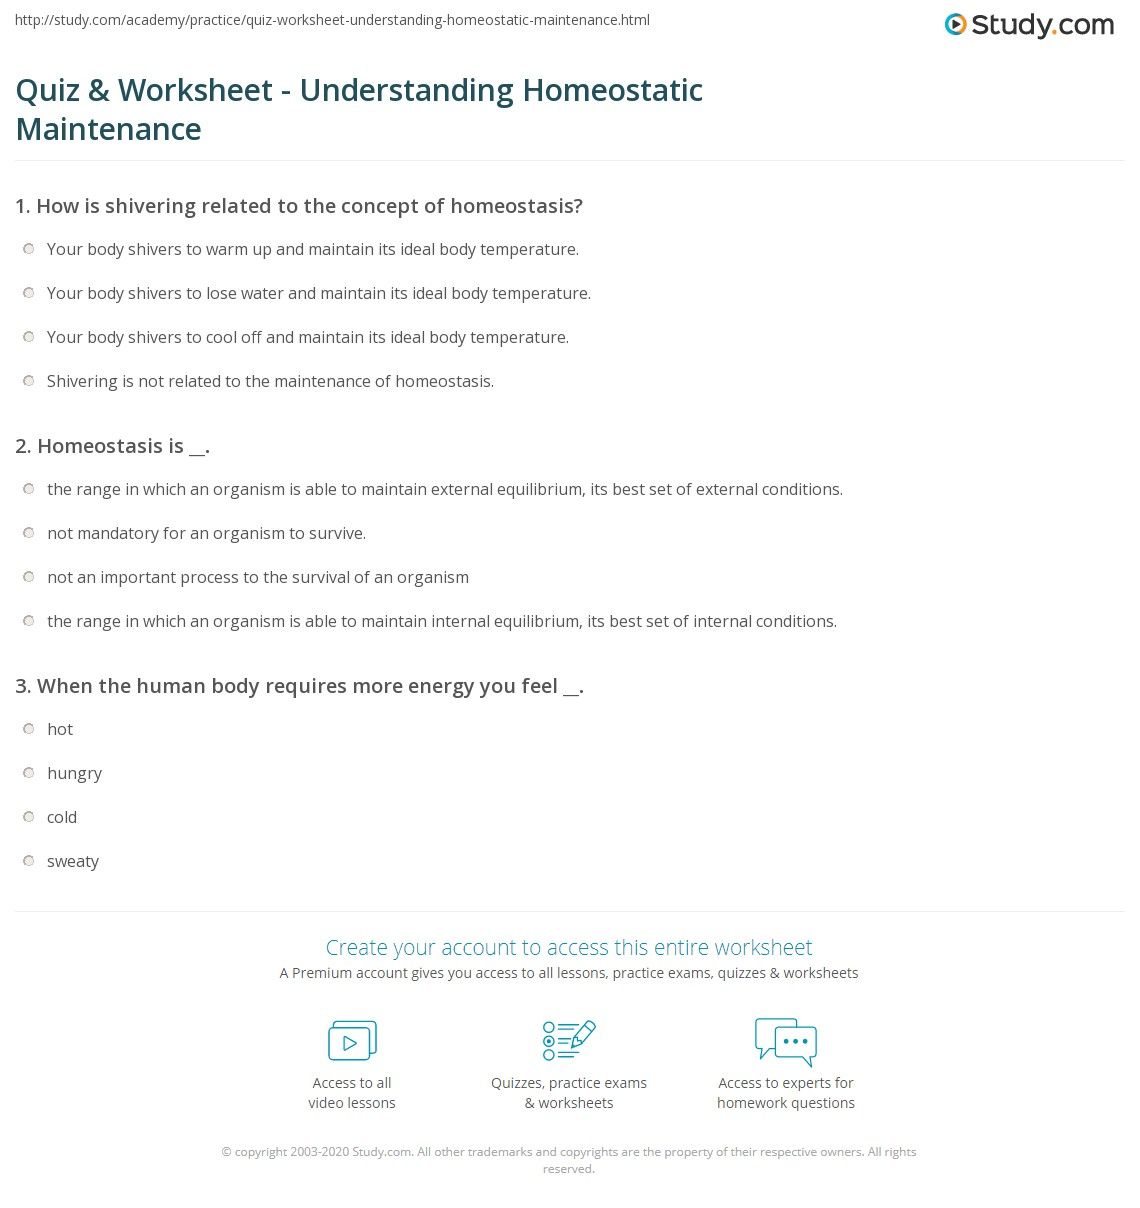 Quiz Worksheet Understanding Homeostatic Maintenance